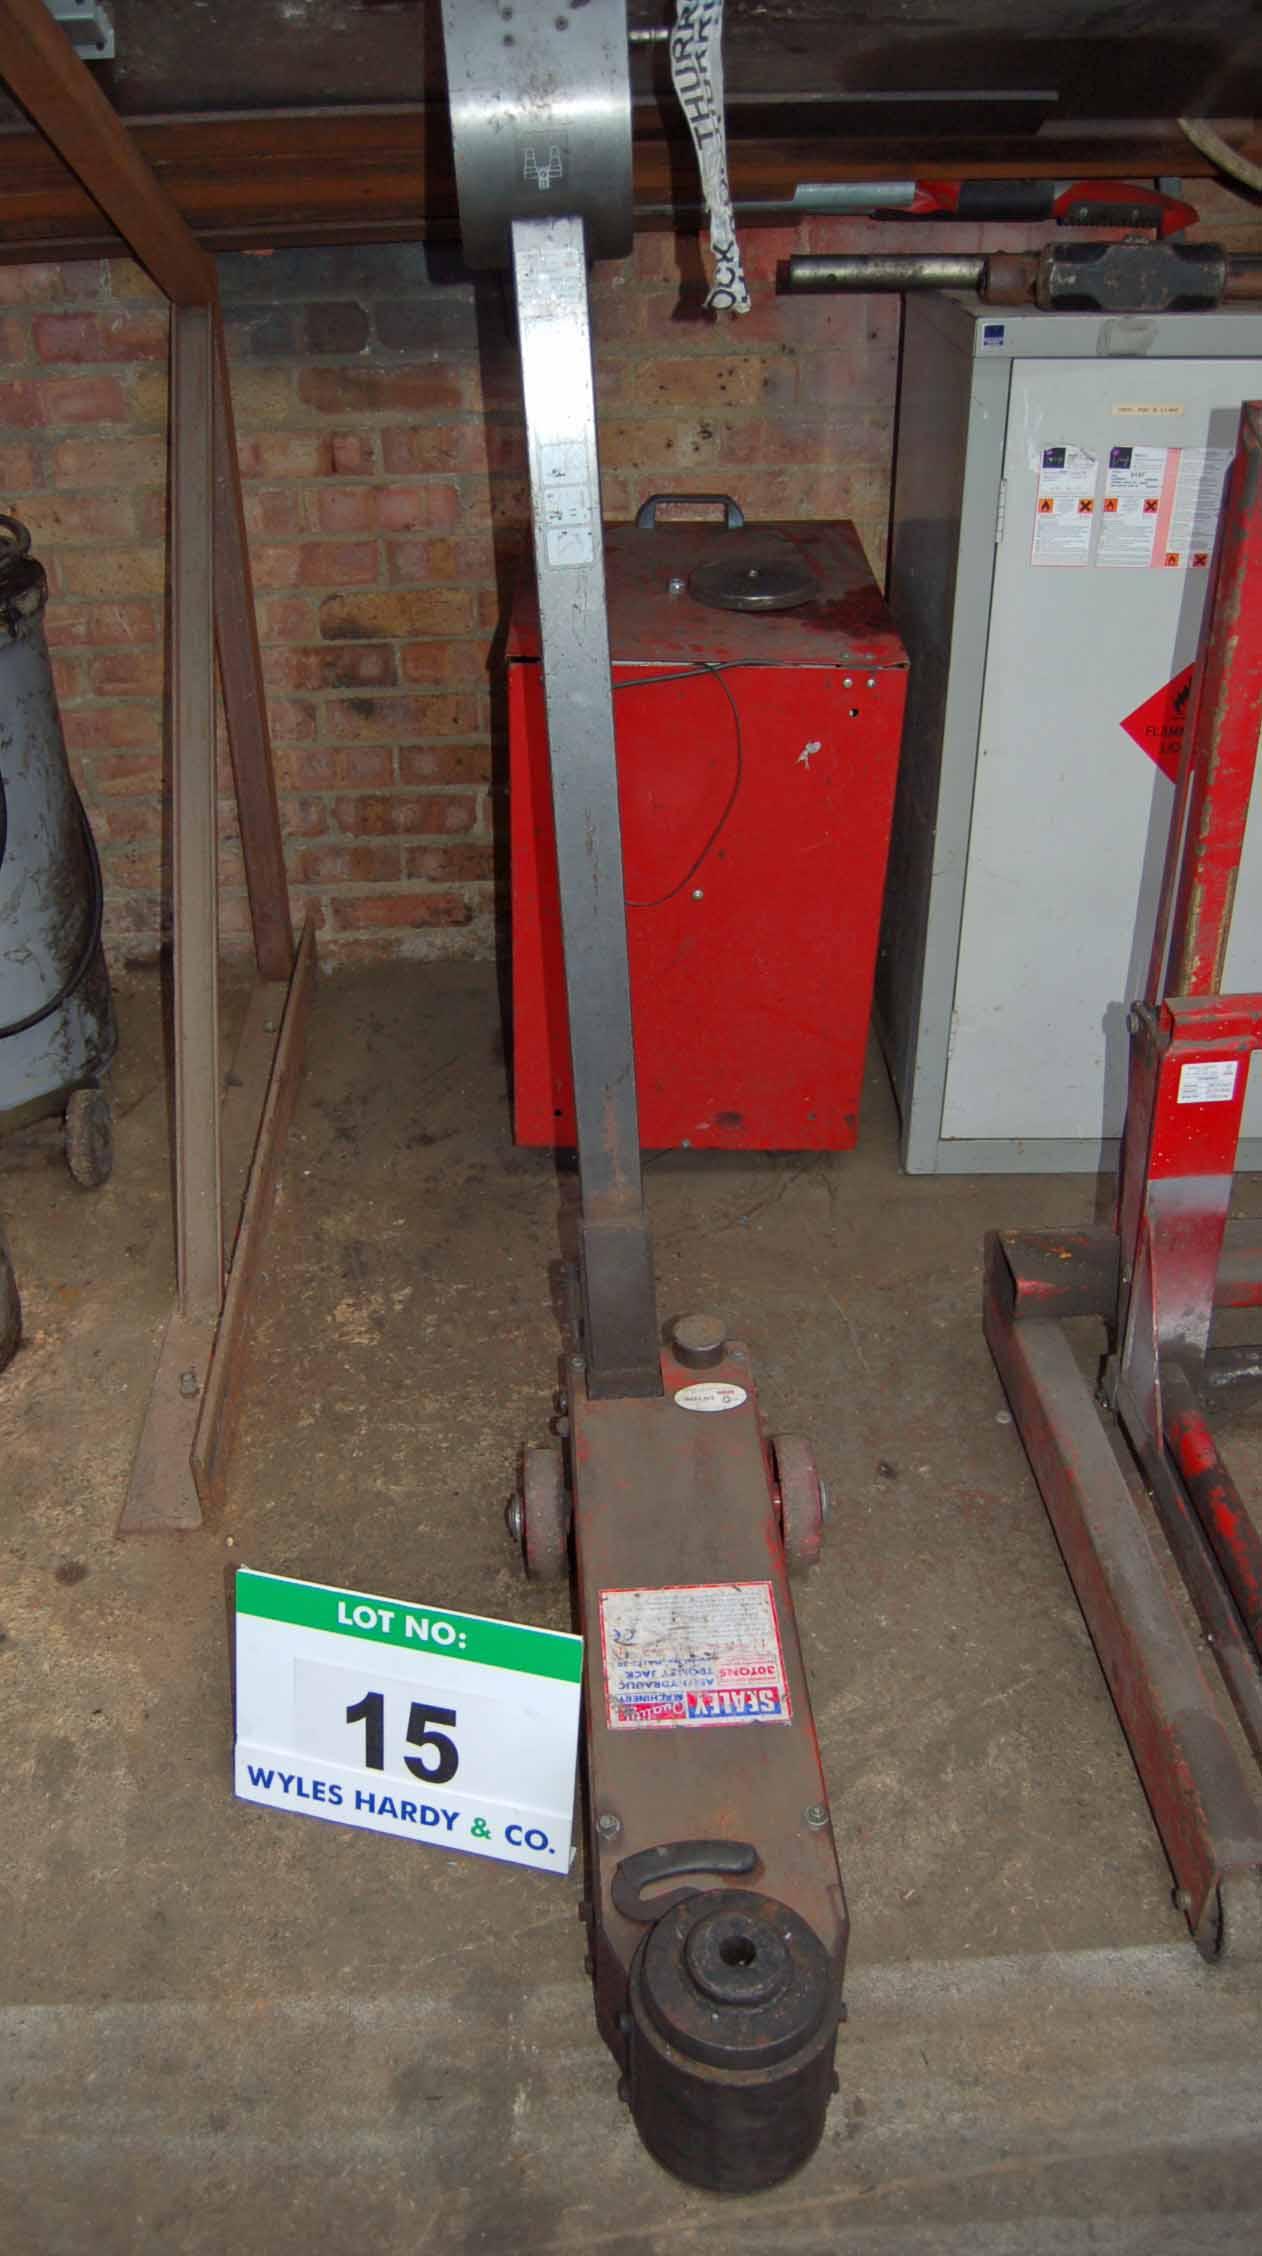 Lot 15 - A SEALEY MAJ15-30 30-Ton capacity Pneumatic-Hydraulic Mobile Trolley Jack